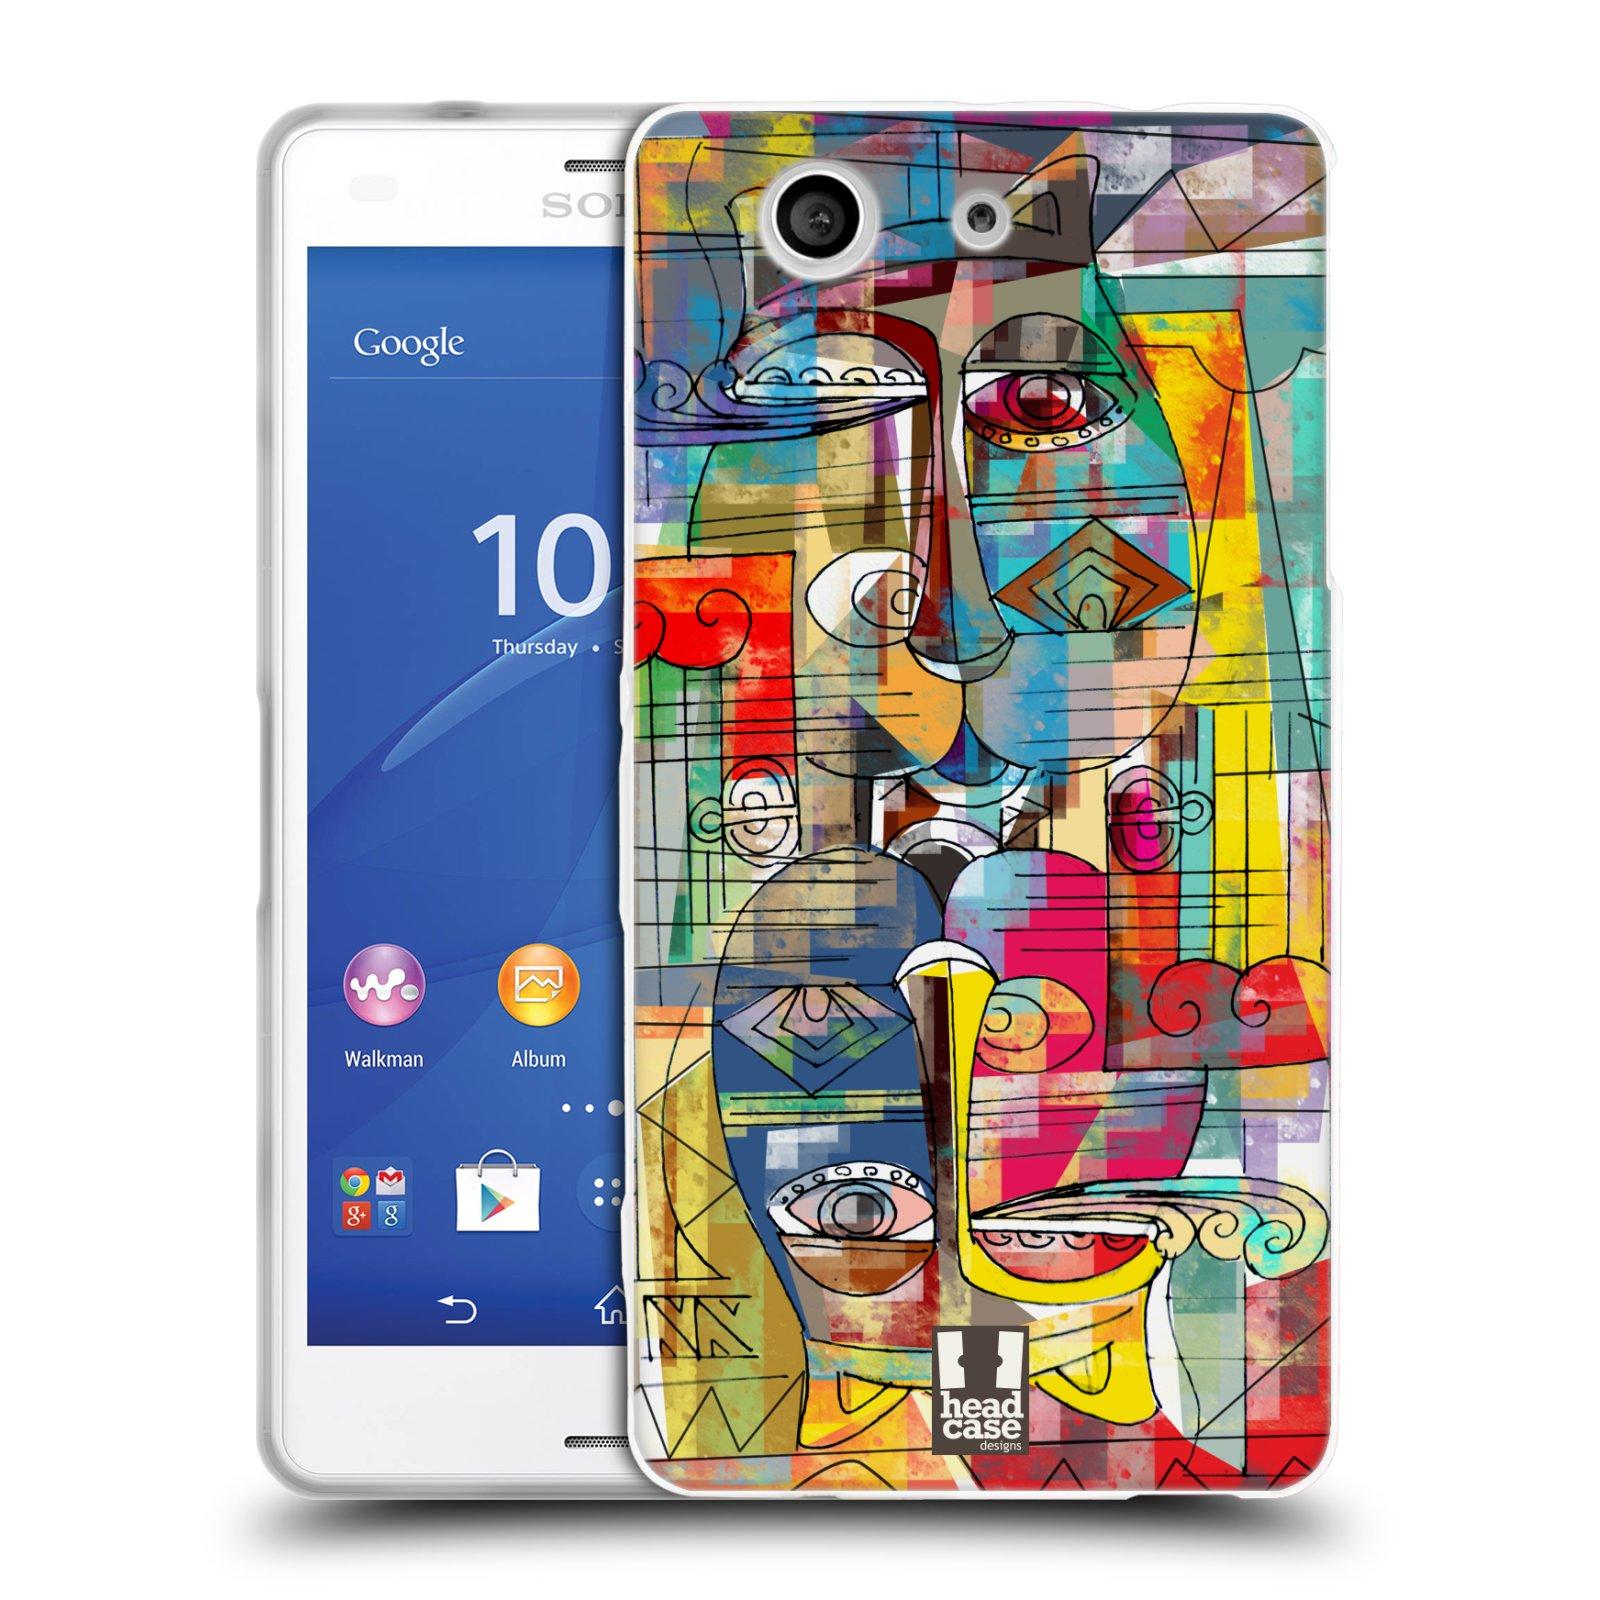 Silikonové pouzdro na mobil Sony Xperia Z3 Compact D5803 HEAD CASE AZTEC MANX